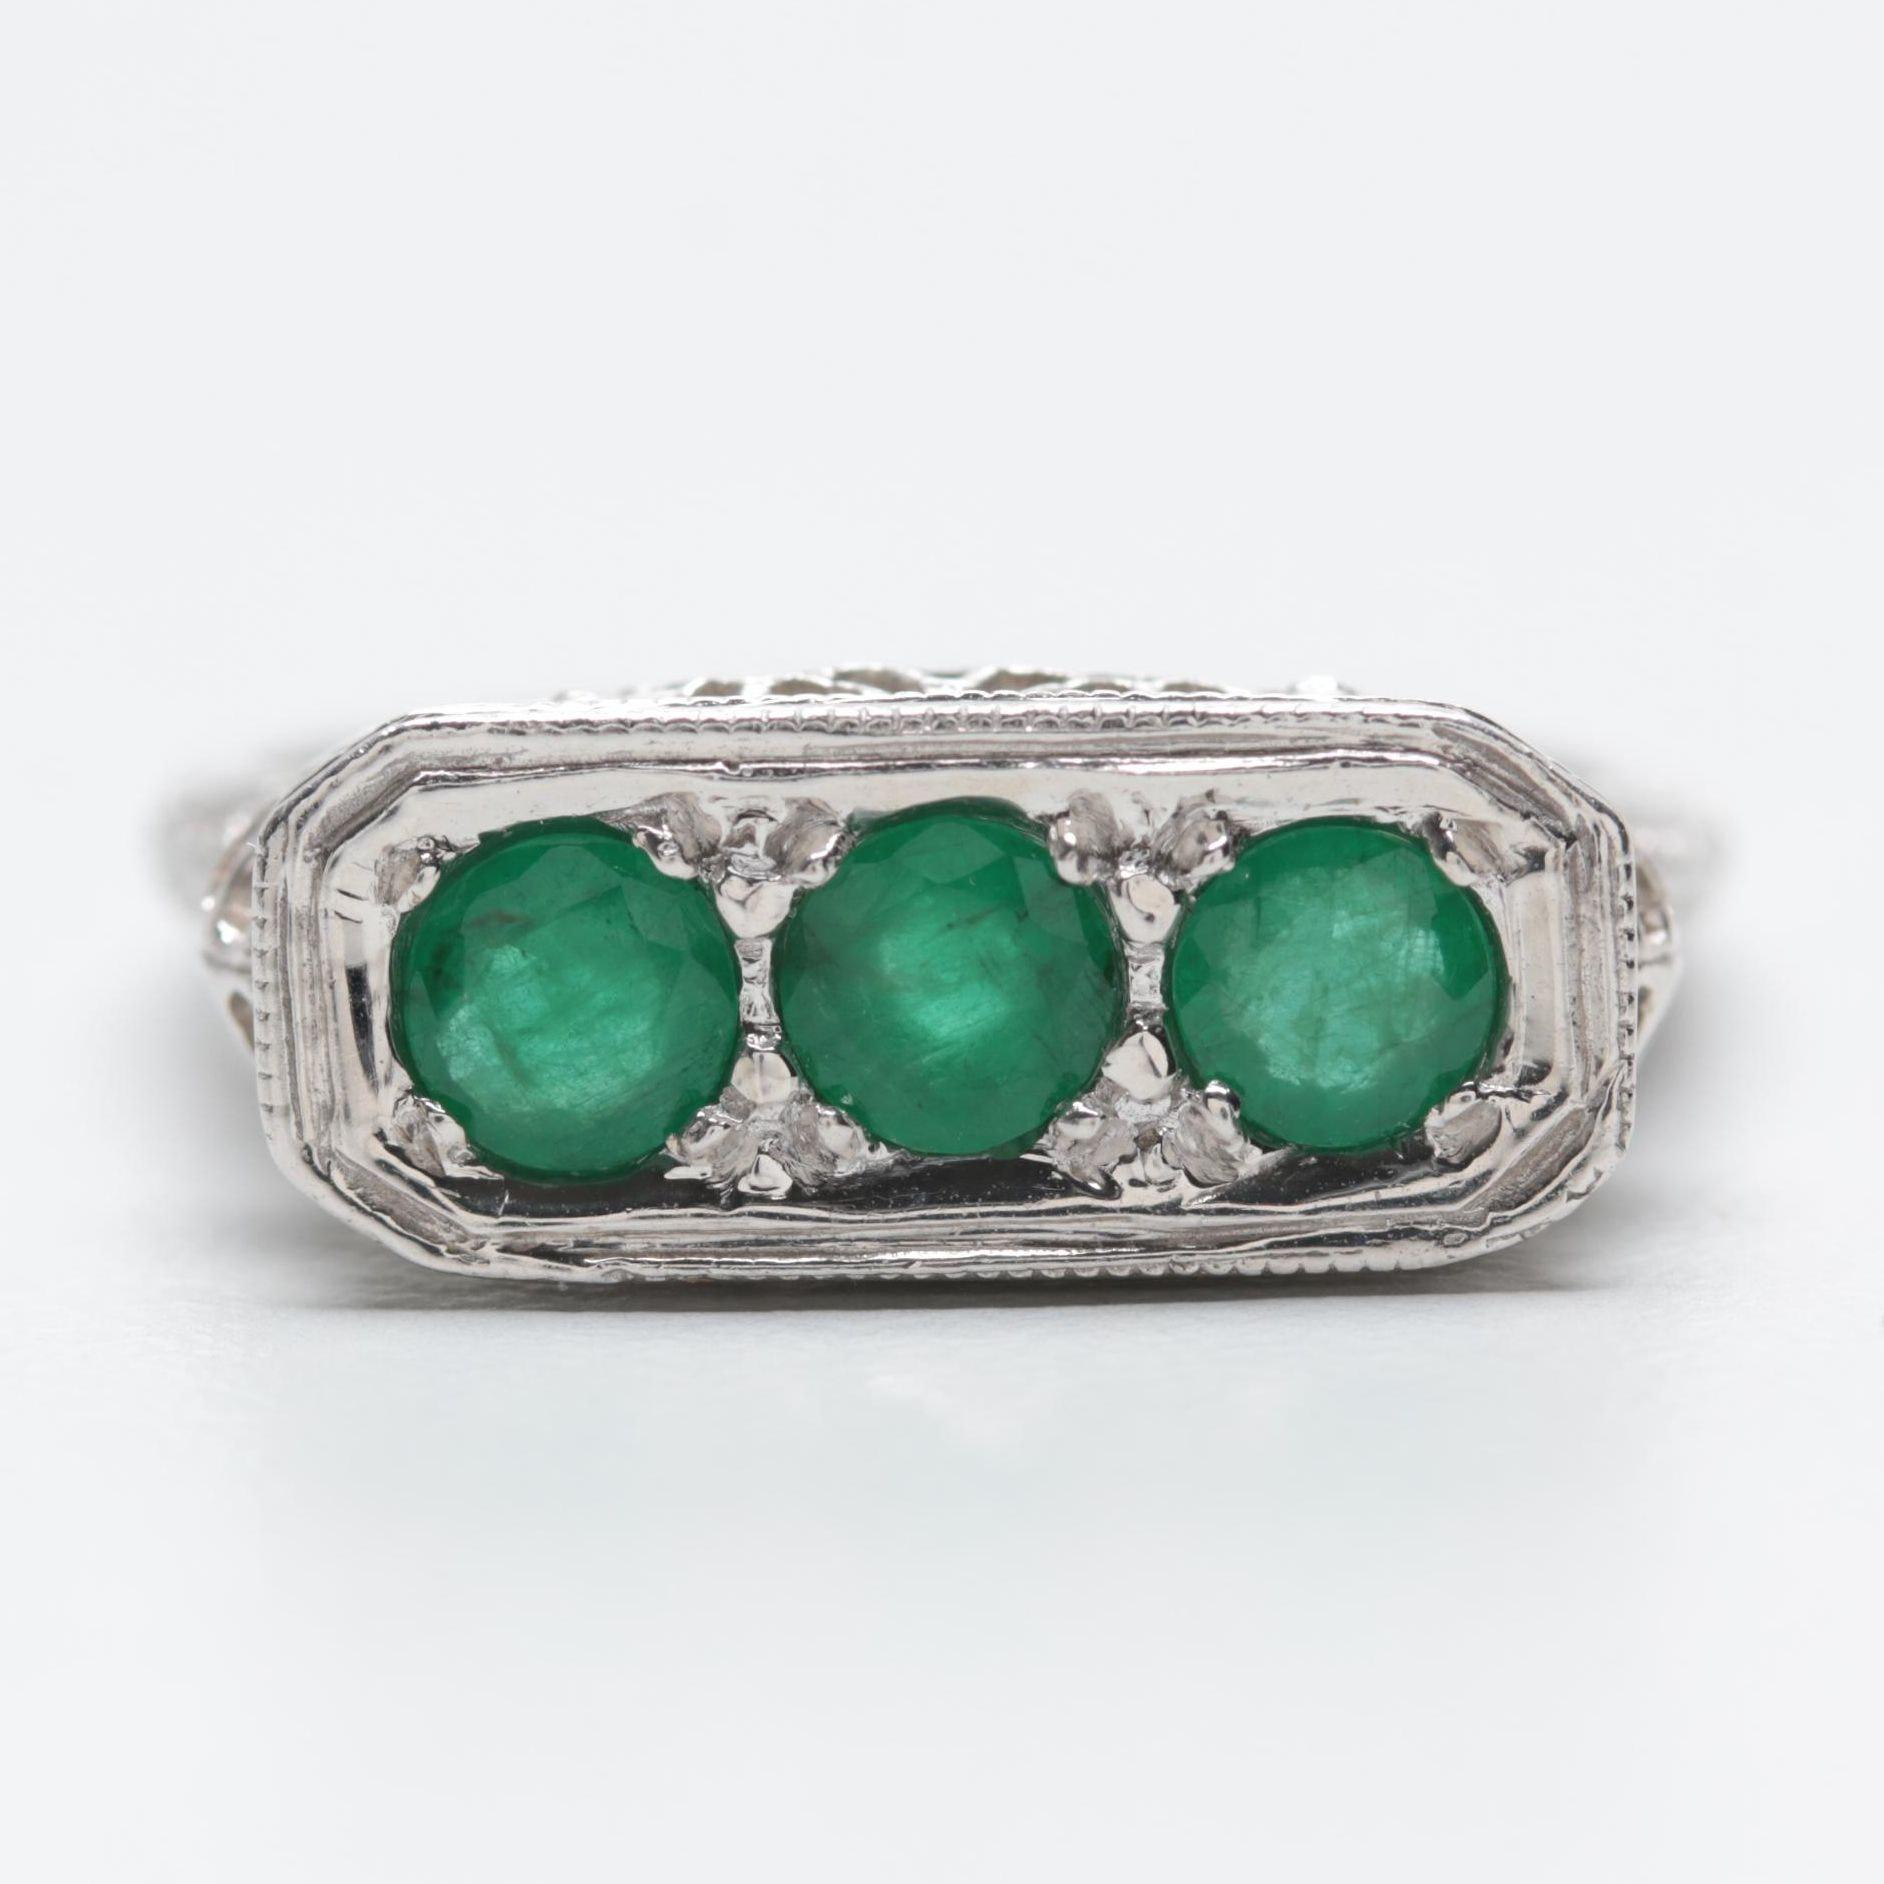 Art Deco 14K White Gold Emerald Ring